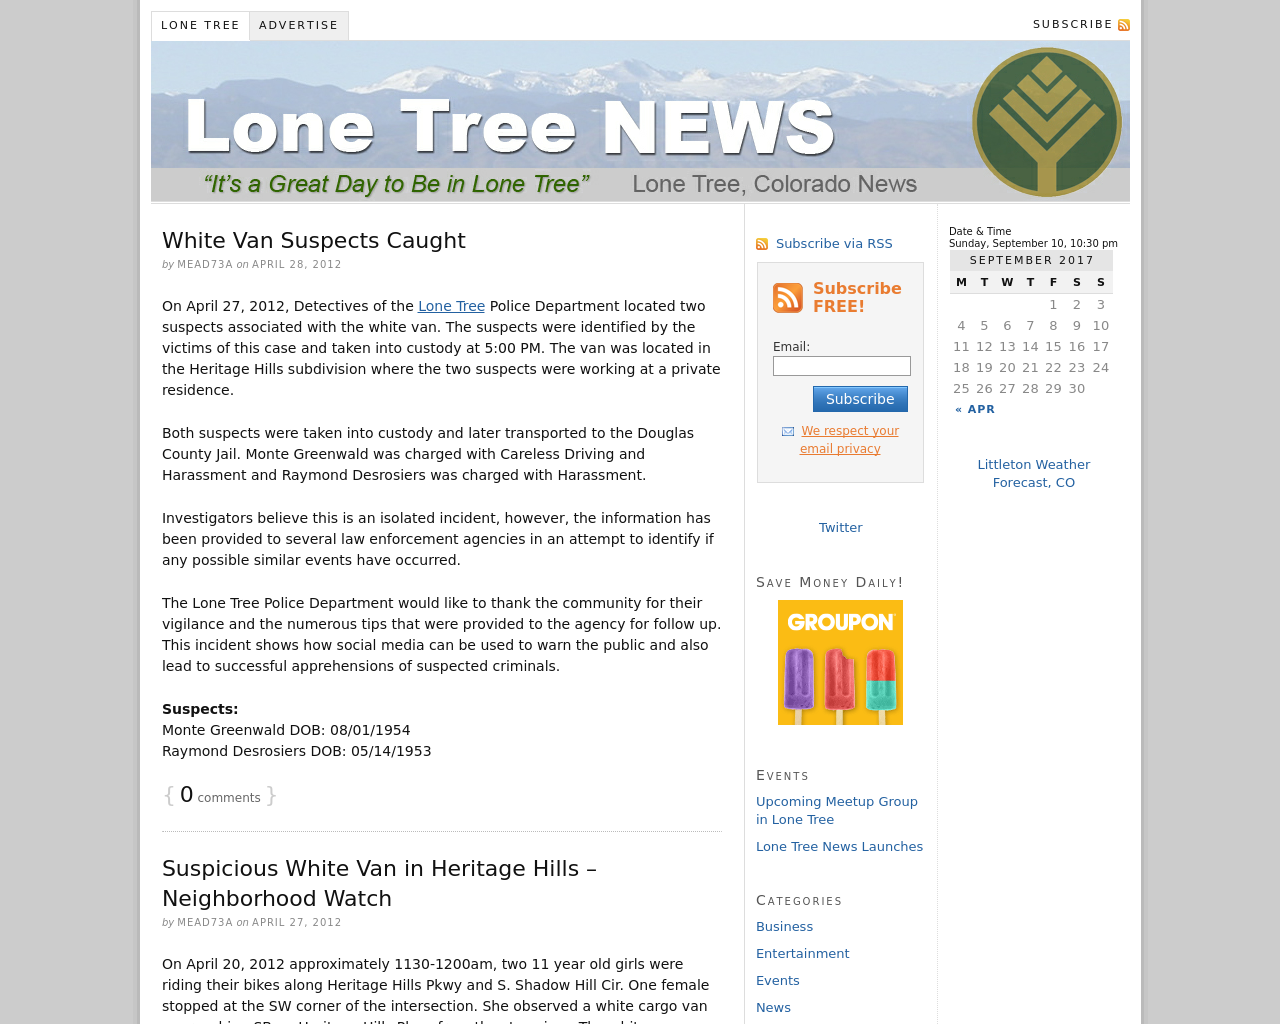 LoneTreeNews-Advertising-Reviews-Pricing